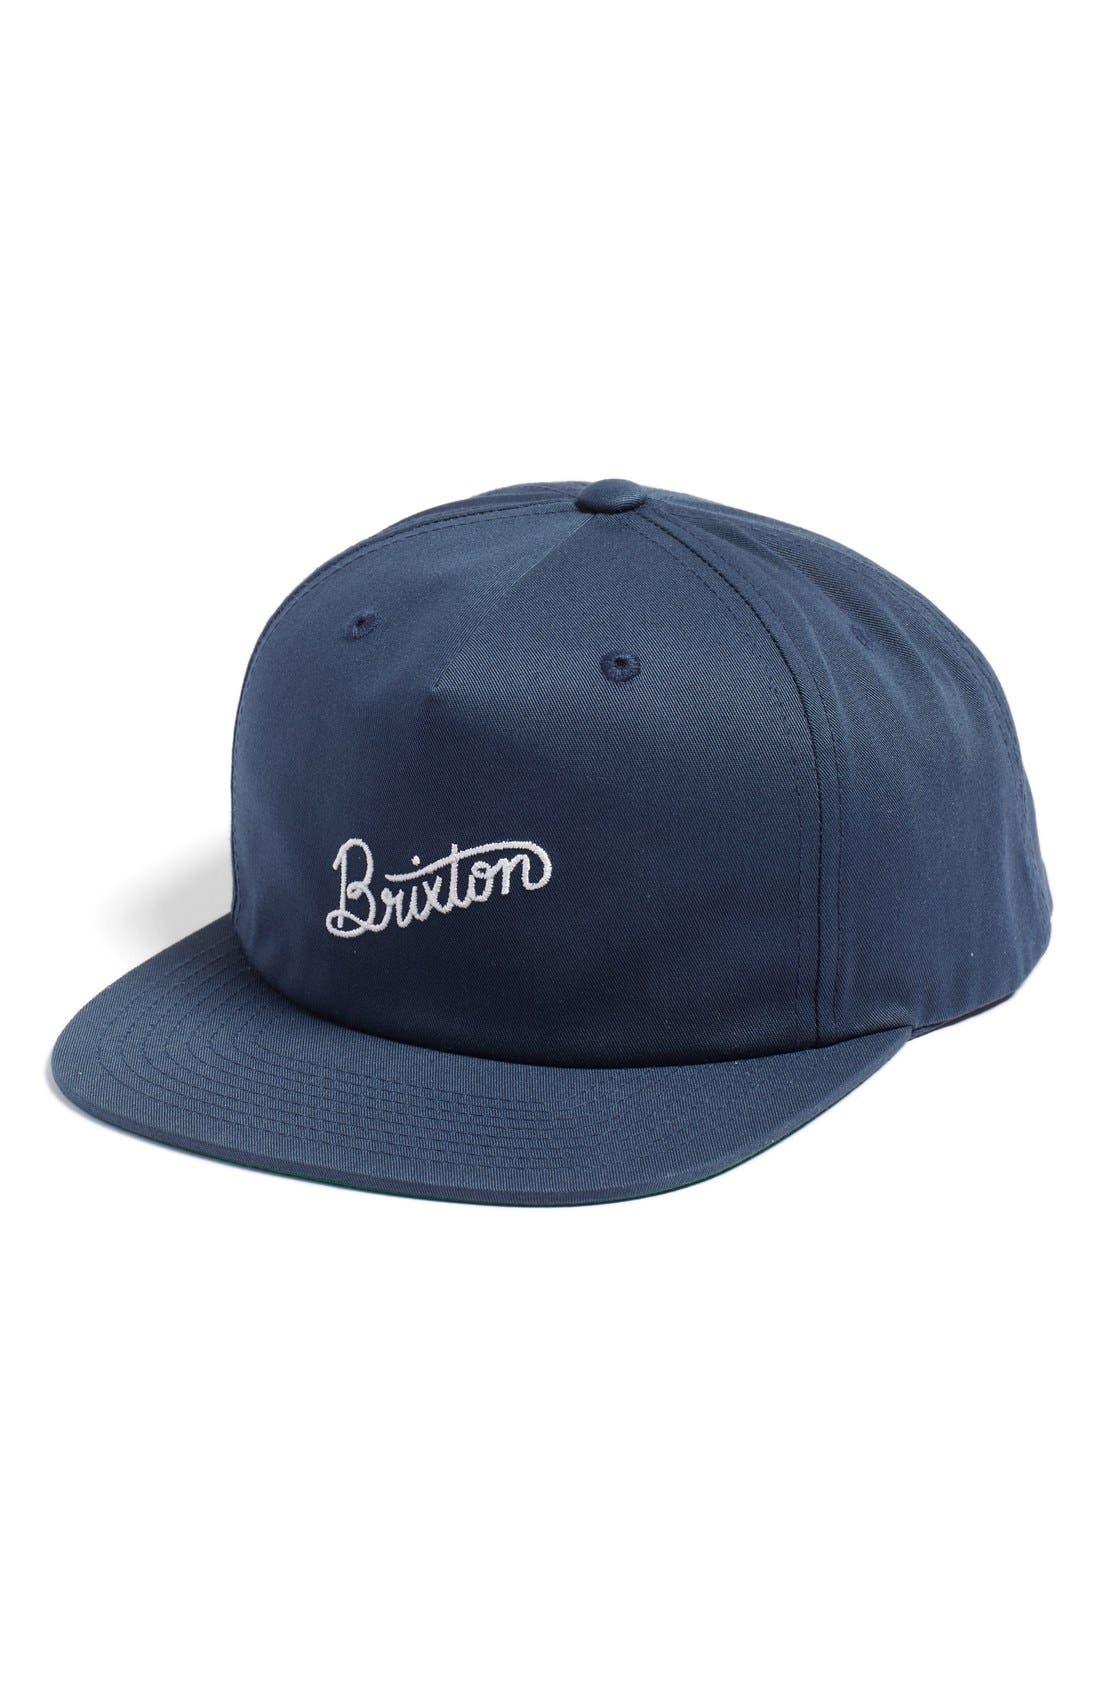 Alternate Image 1 Selected - Brixton 'Sunder' Snapback Cap